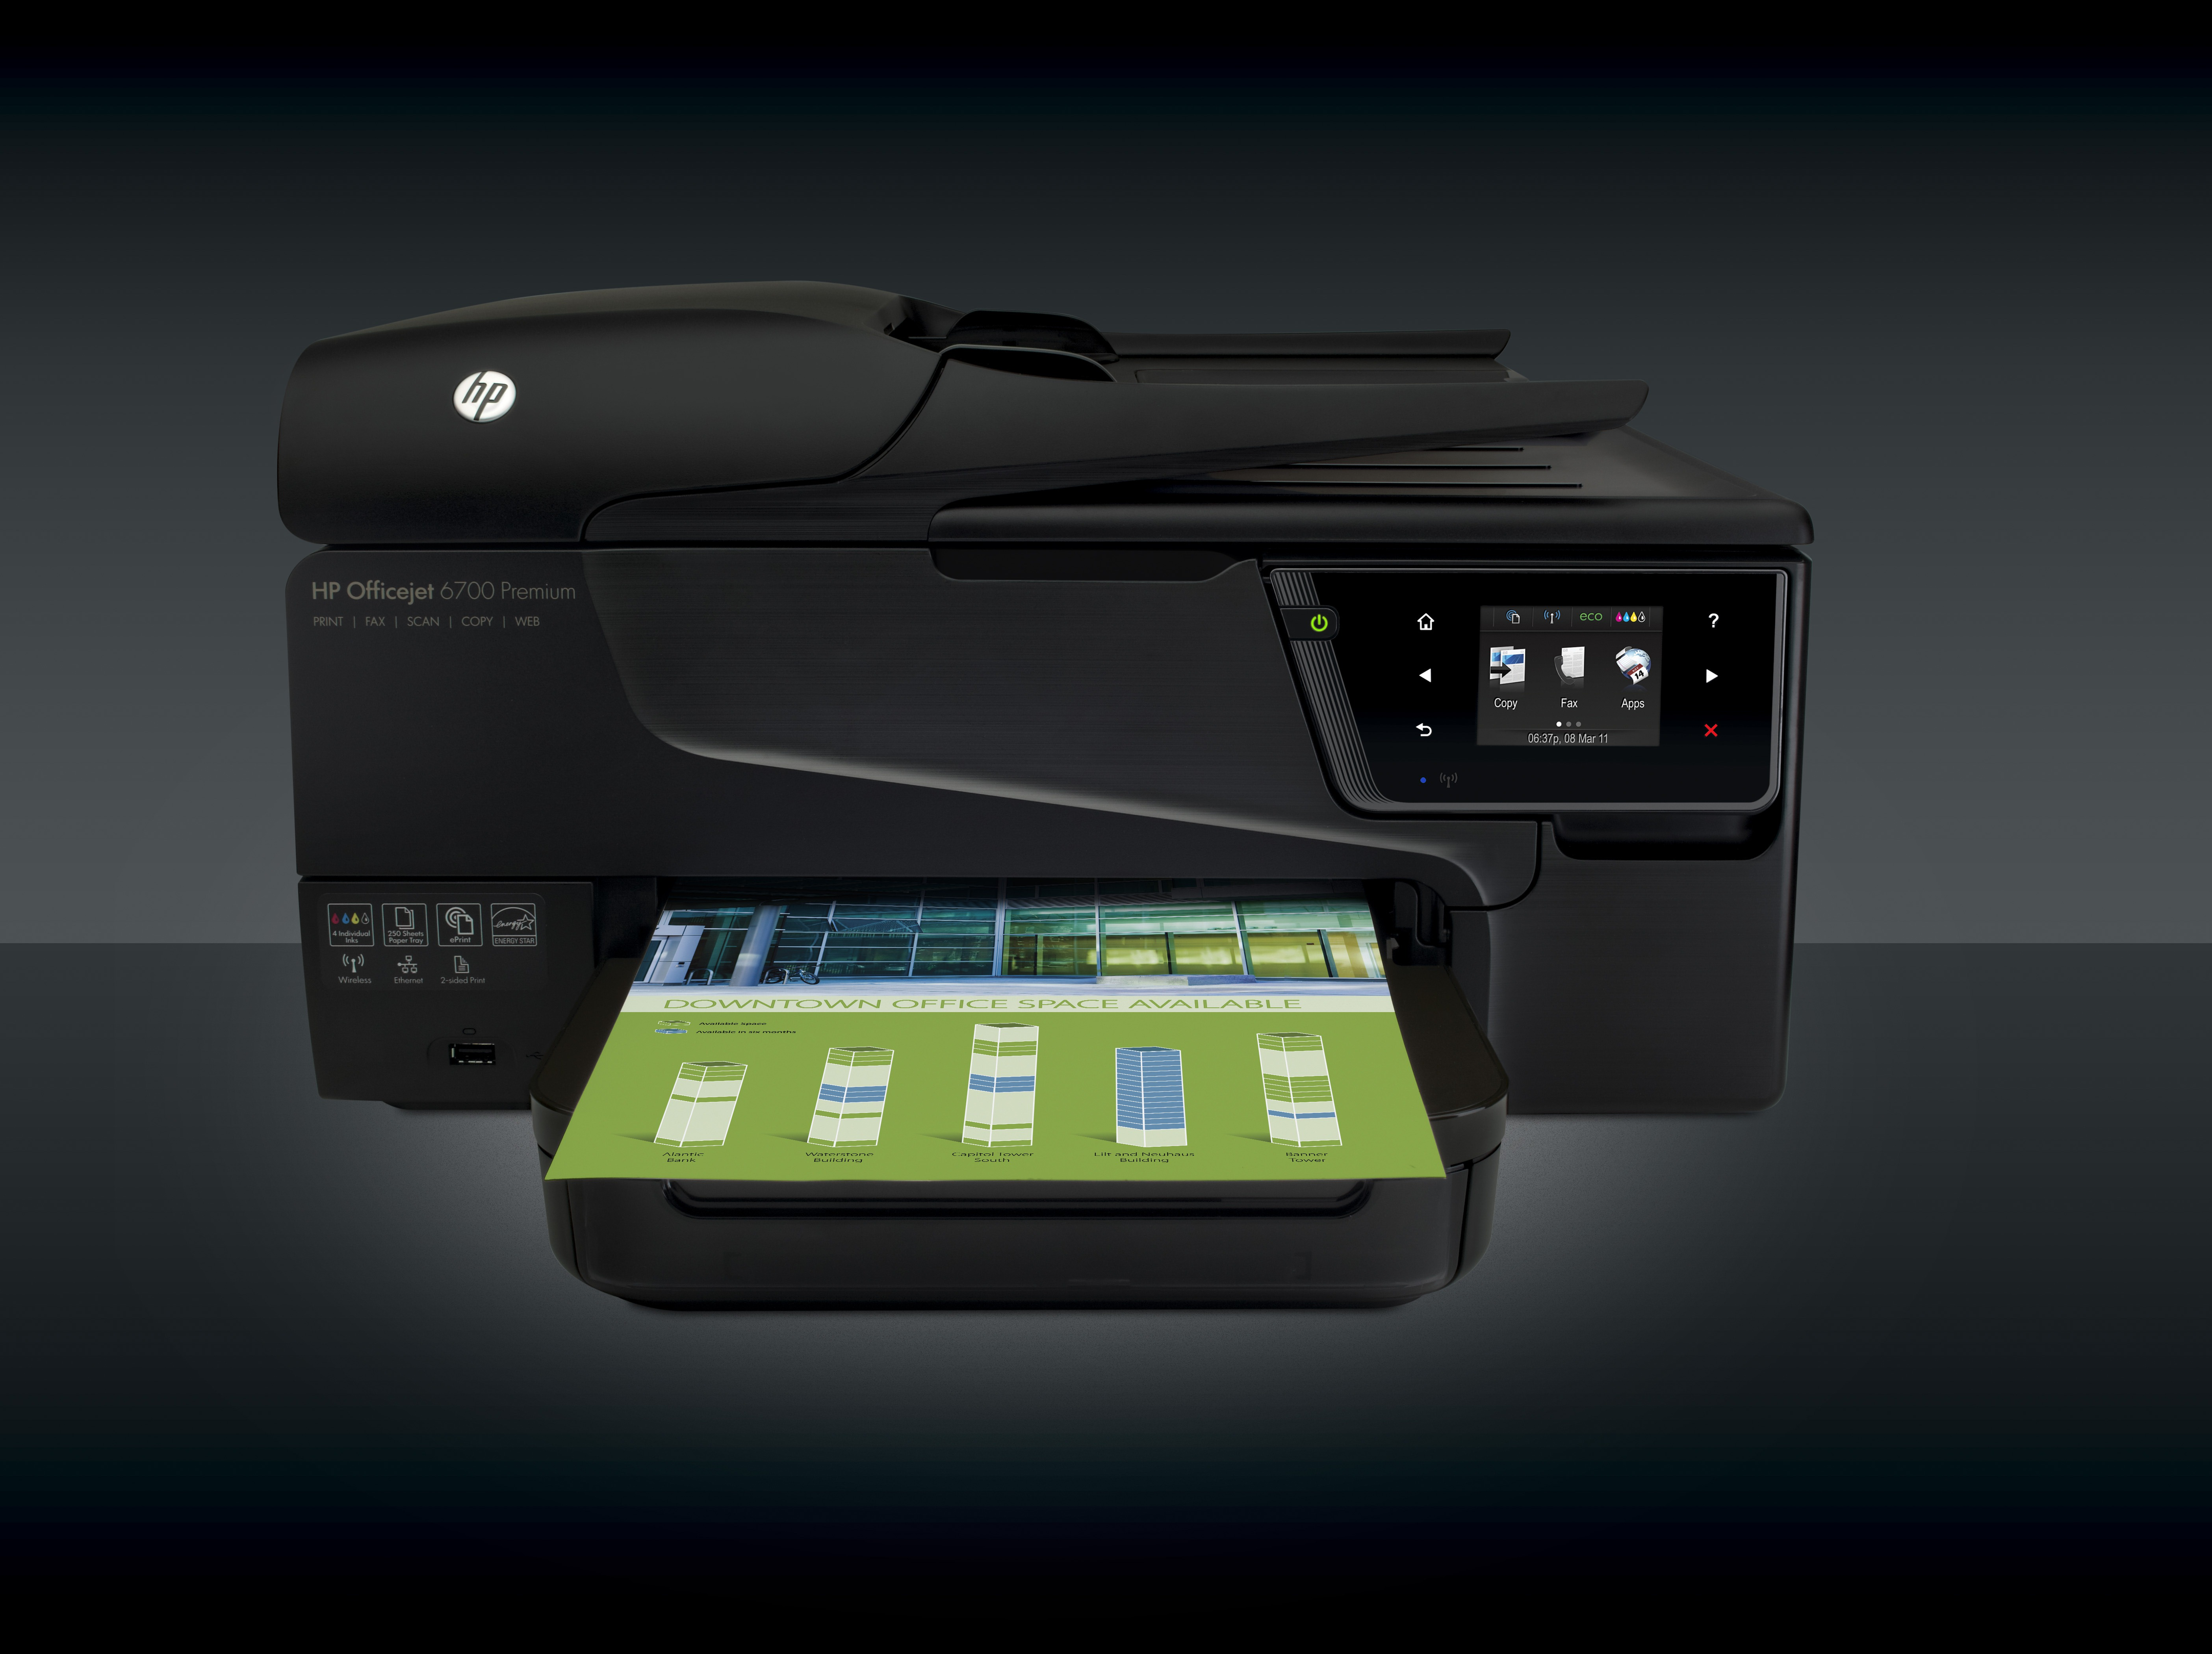 HP Officejet 6700 Premium, , drivers para Windows, Mac, Linux